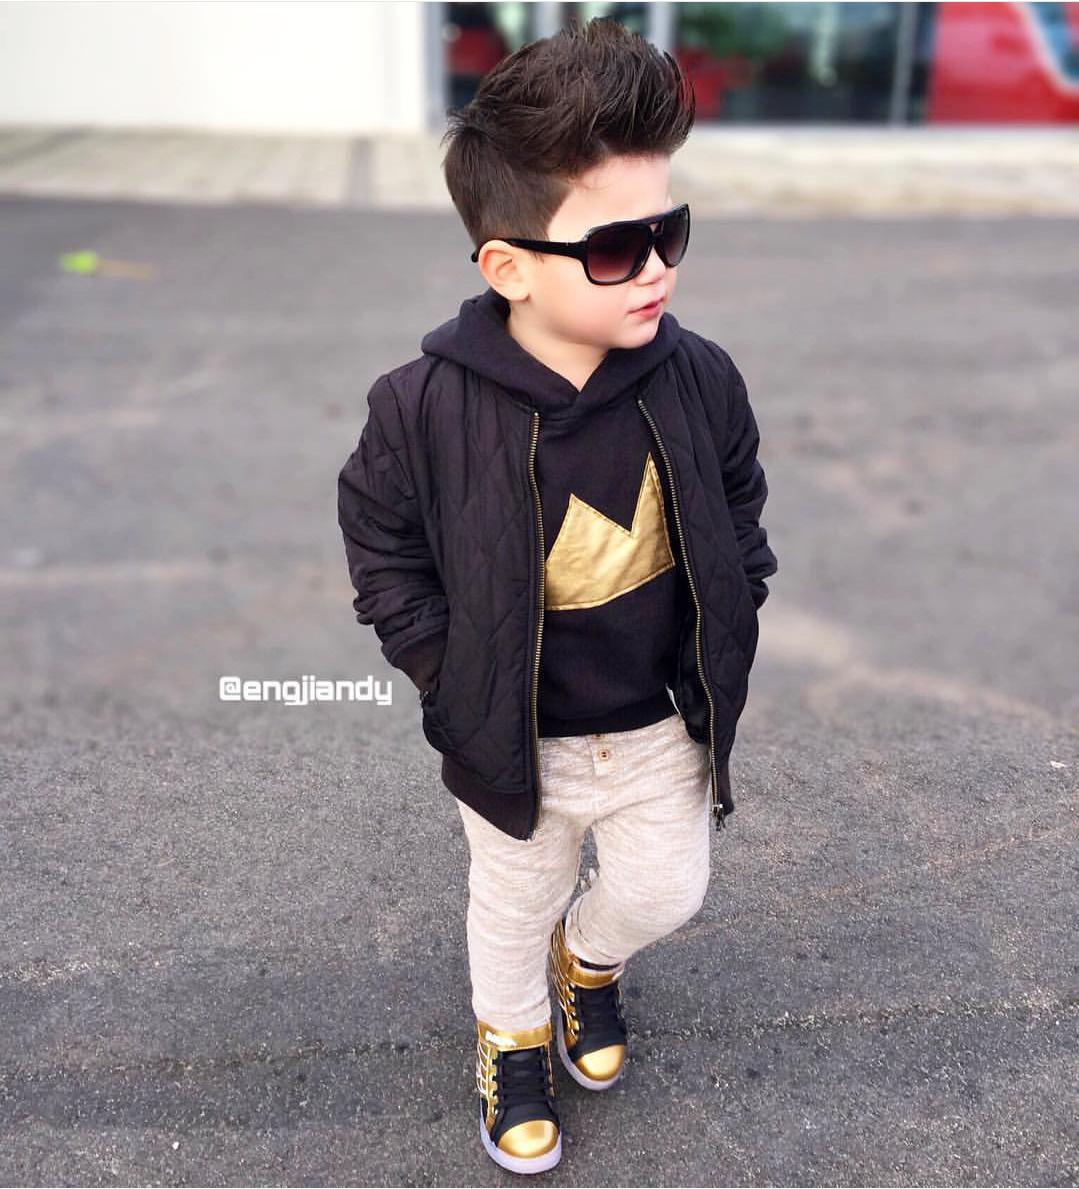 Insta Engjiandy Style Little Boy Meninos Pinterest Boy Fashion Babies And Kids Outfits